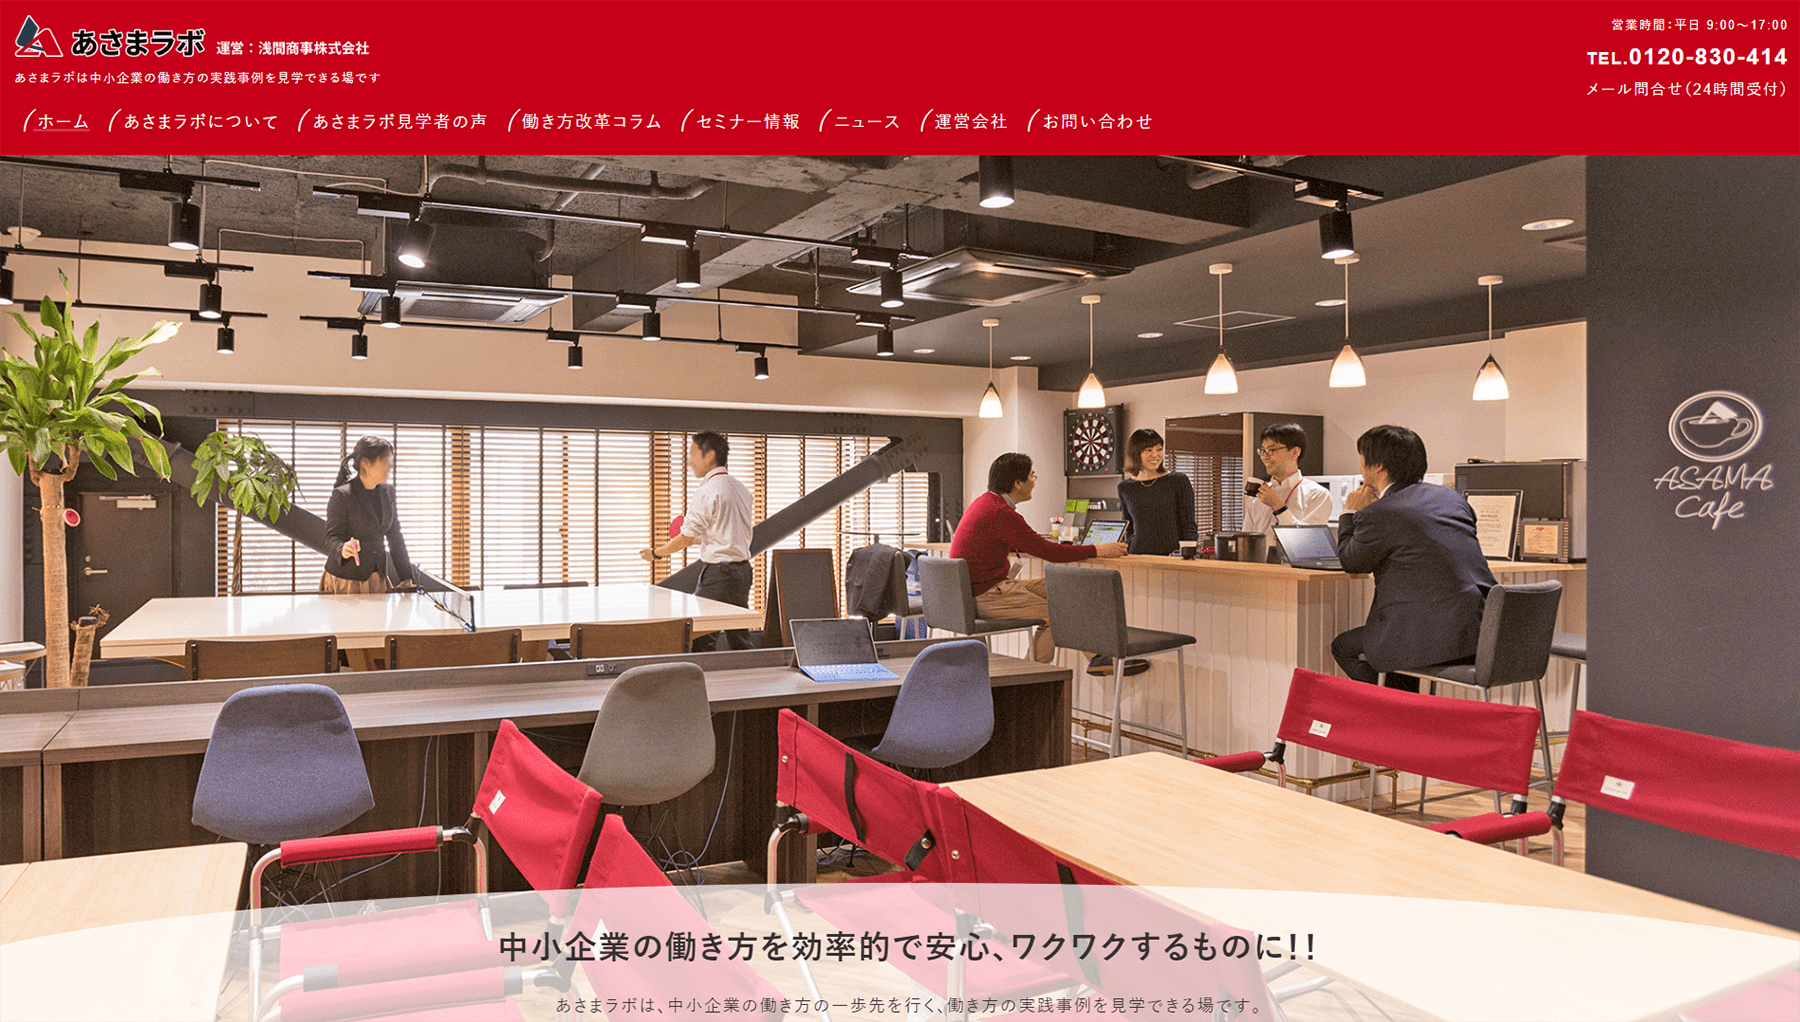 thumnail:浅間商事株式会社さまのウェブサイト